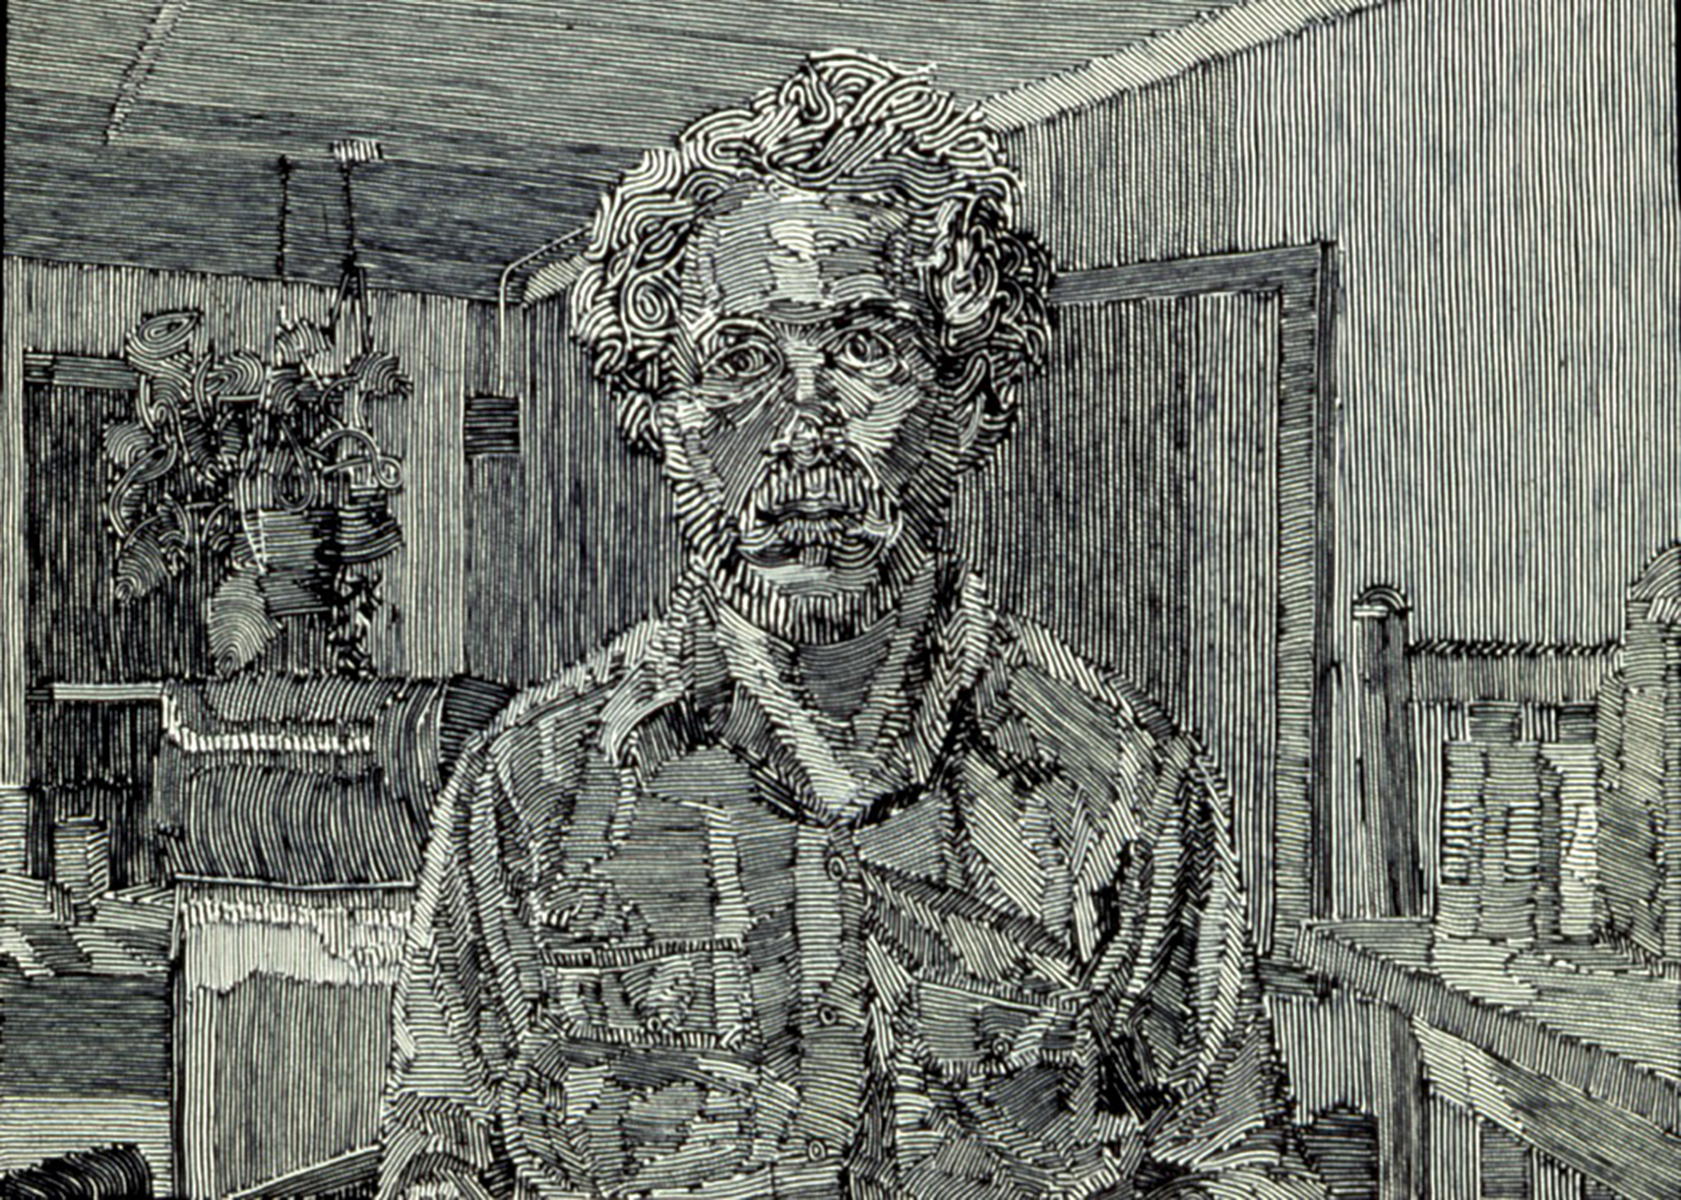 SelfPortrai #1 1976